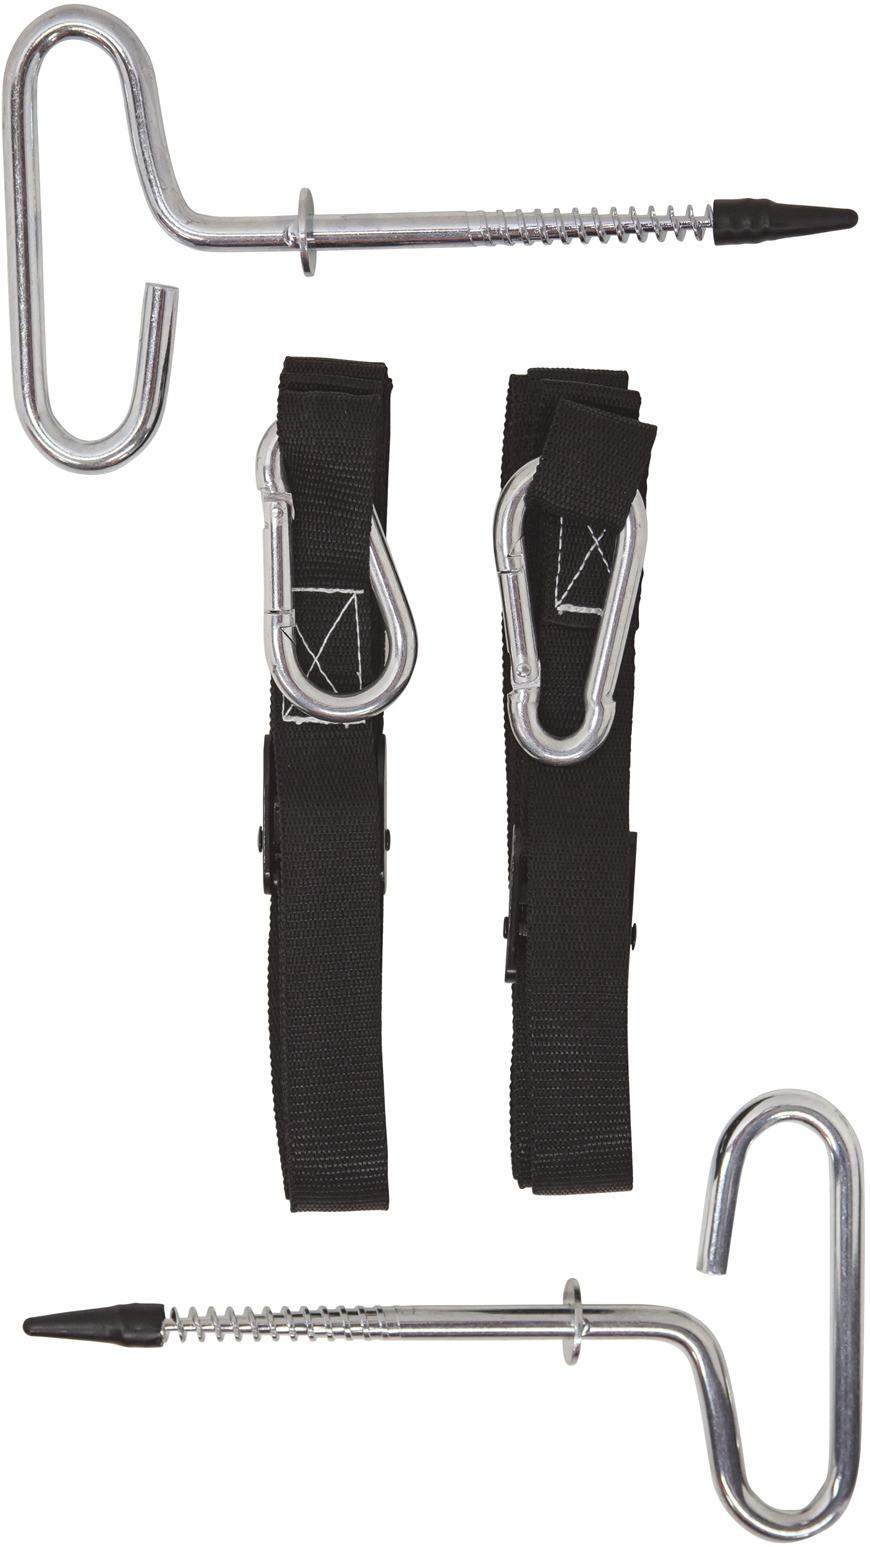 Eskimo 24260 Deluxe Tie Down Kit